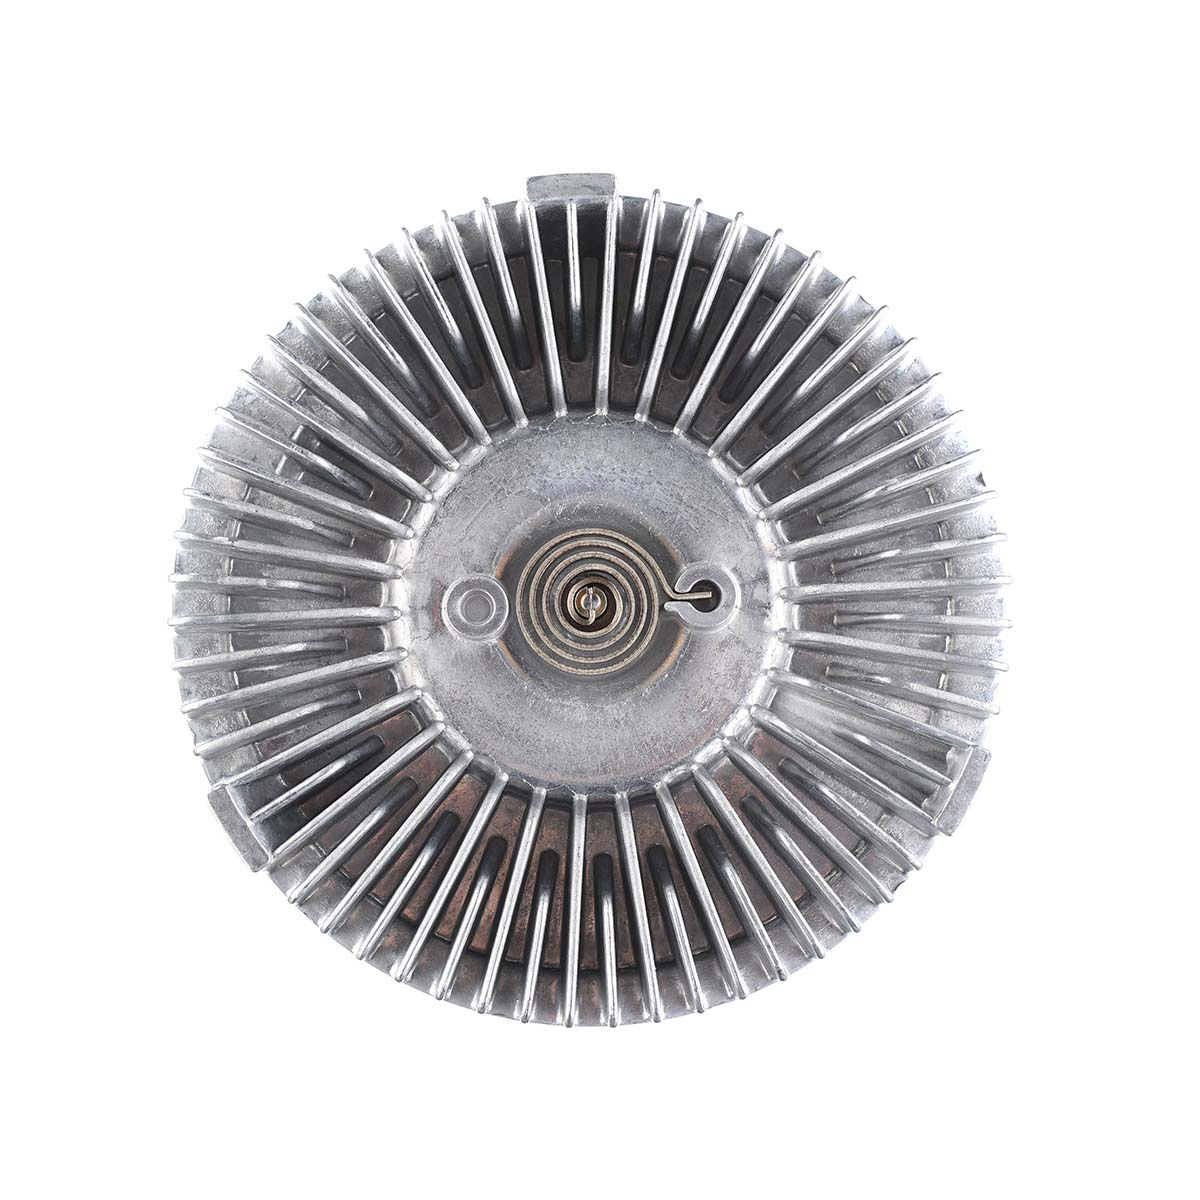 engine cooling fan clutch for ford ranger 1998 1999 2011 explorer sport trac mazda b4000 [ 1200 x 1200 Pixel ]